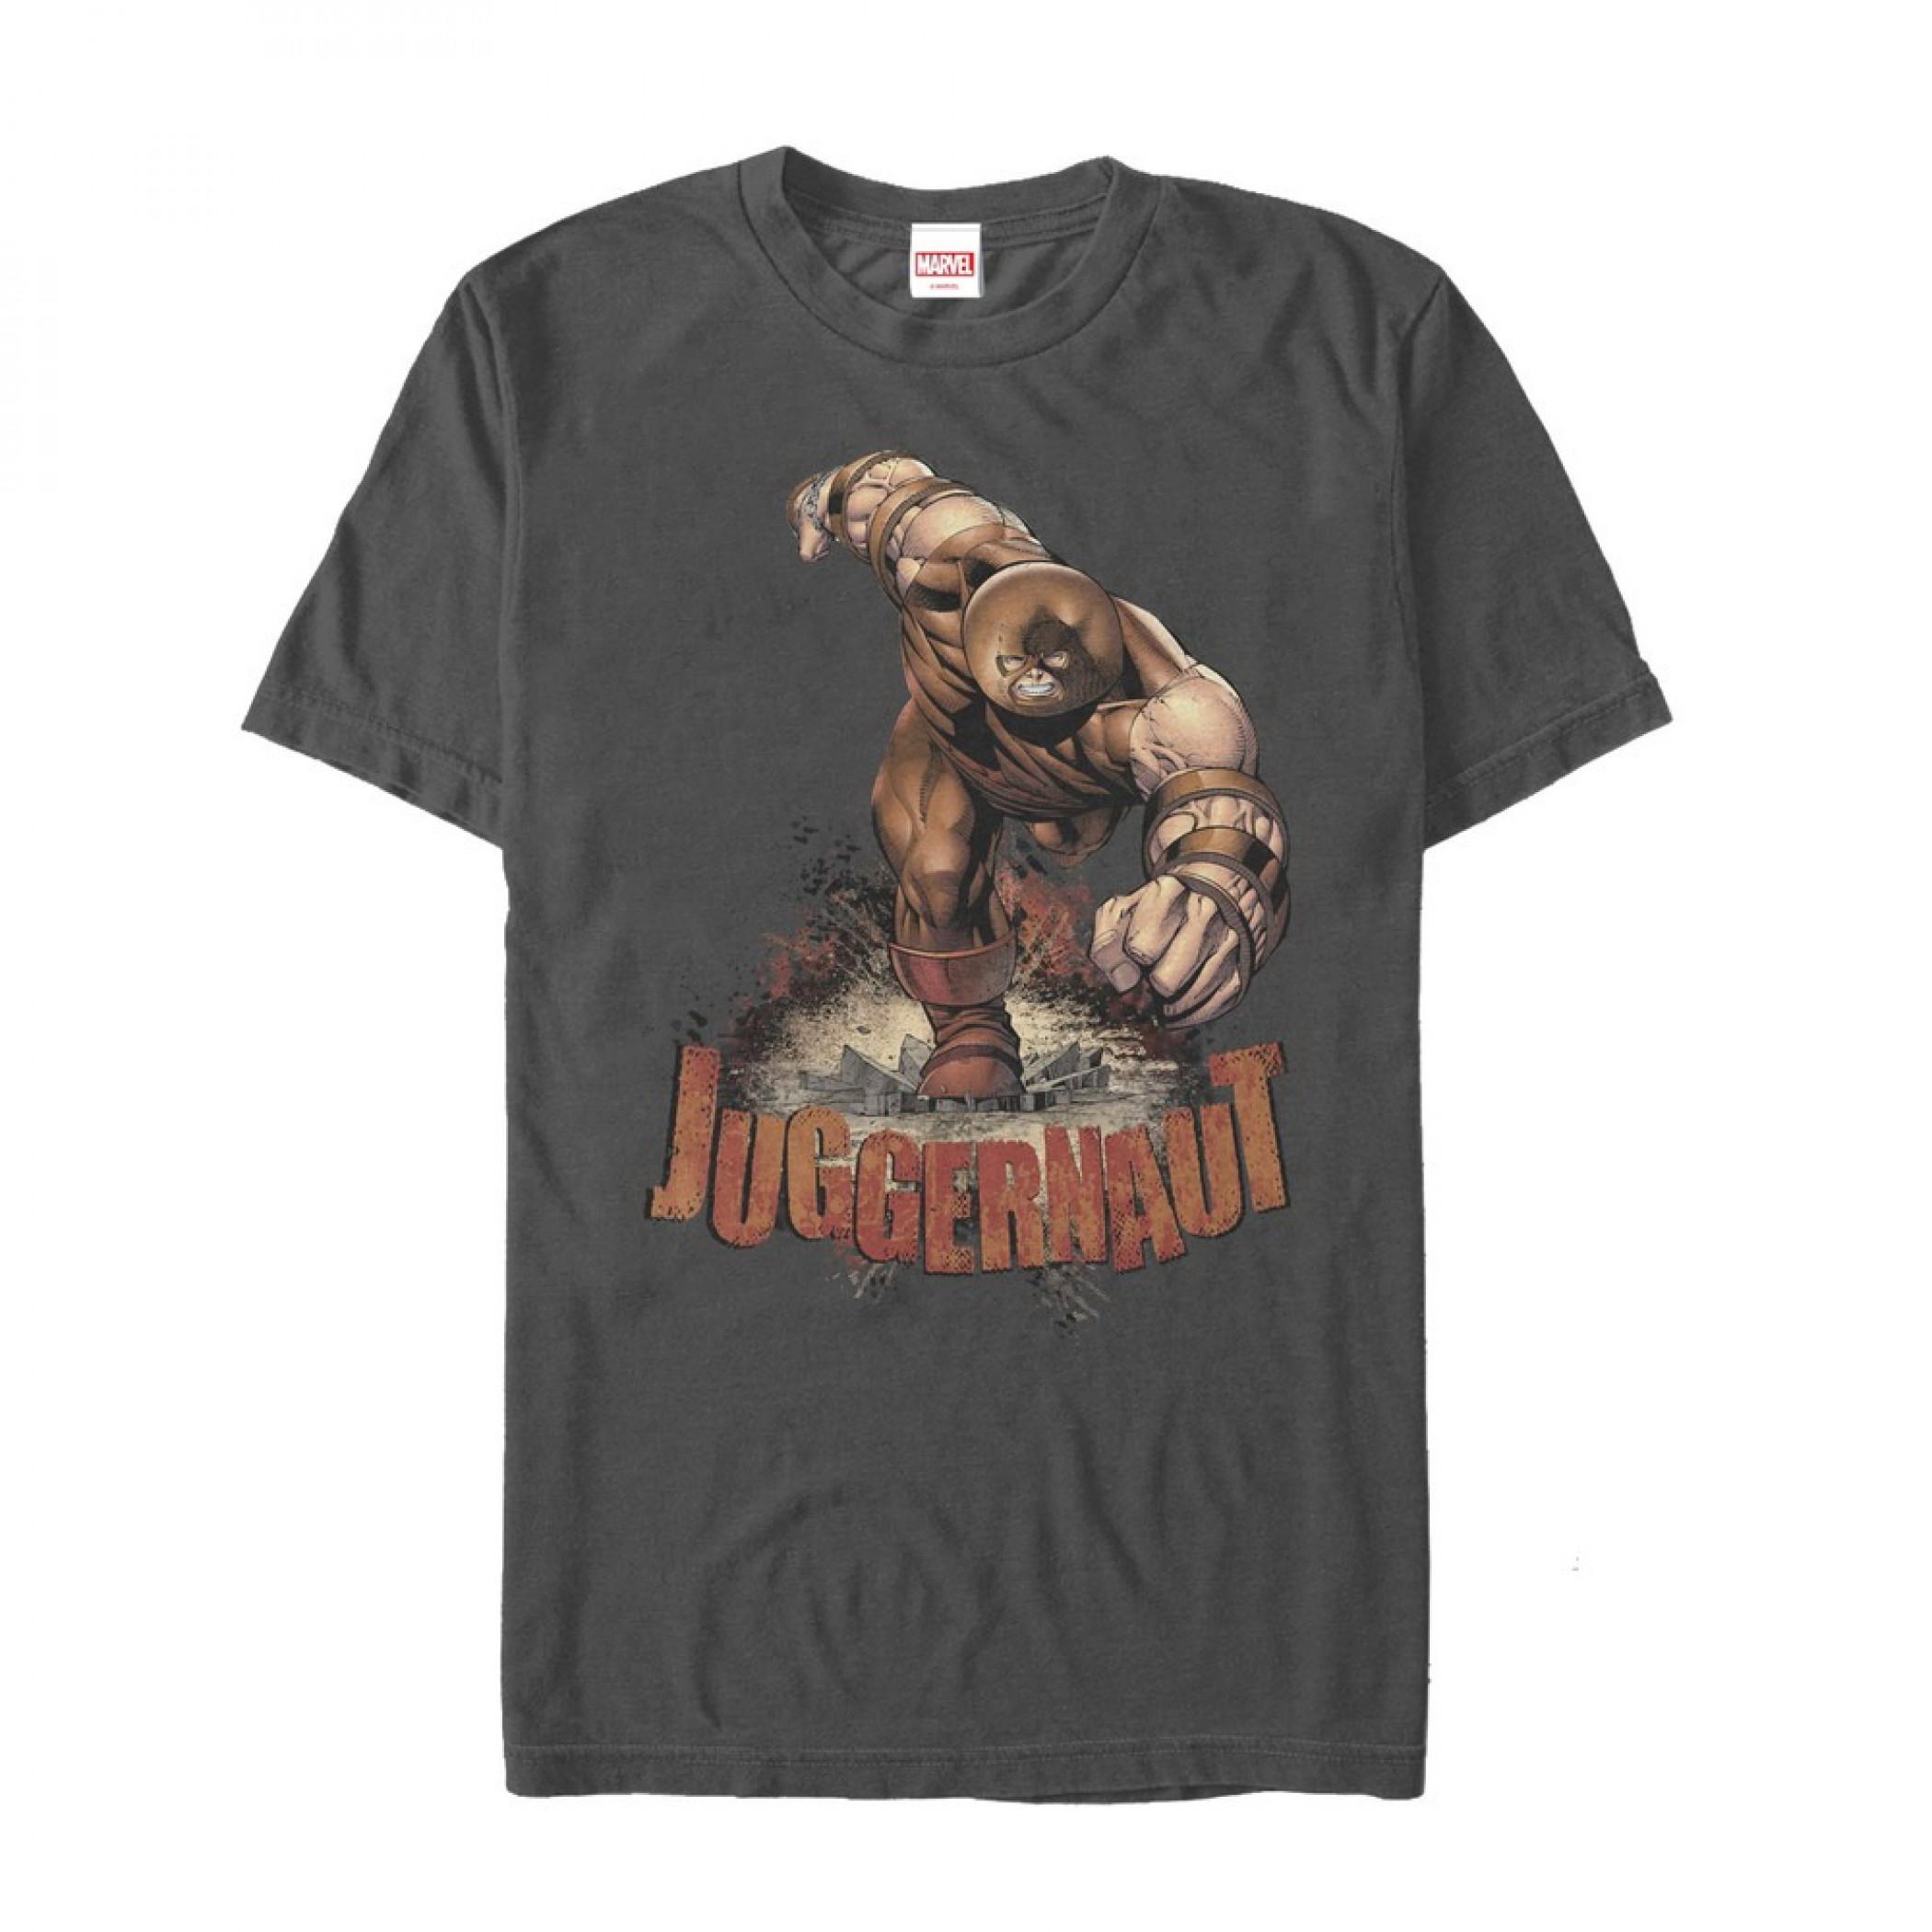 X-Men Juggernaut Charging T-Shirt